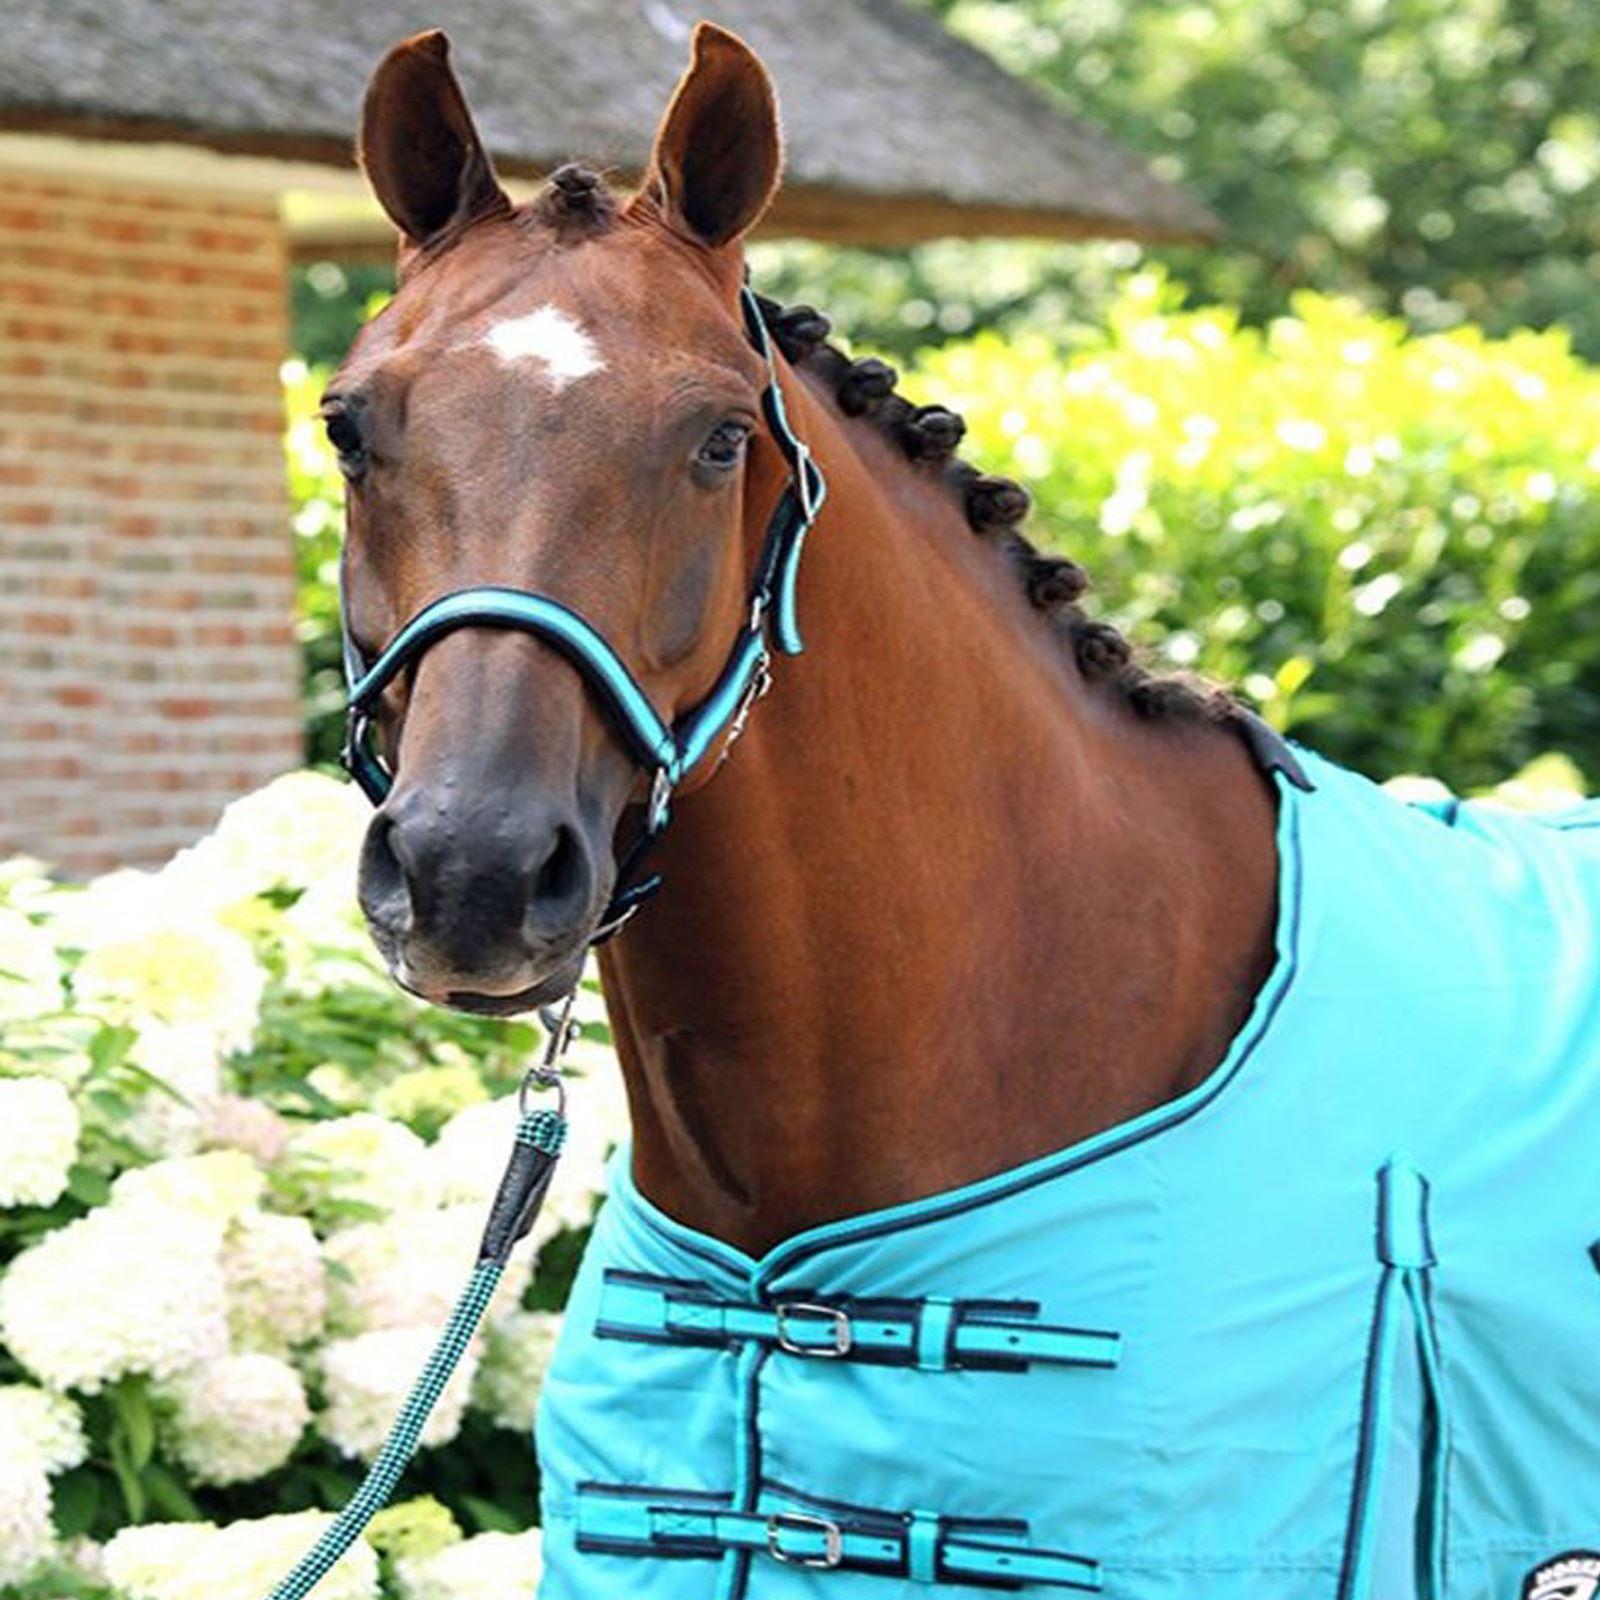 Horka Nylon Snake Headcollar Adjustable Leather Headpiece Noseband Horse Halter